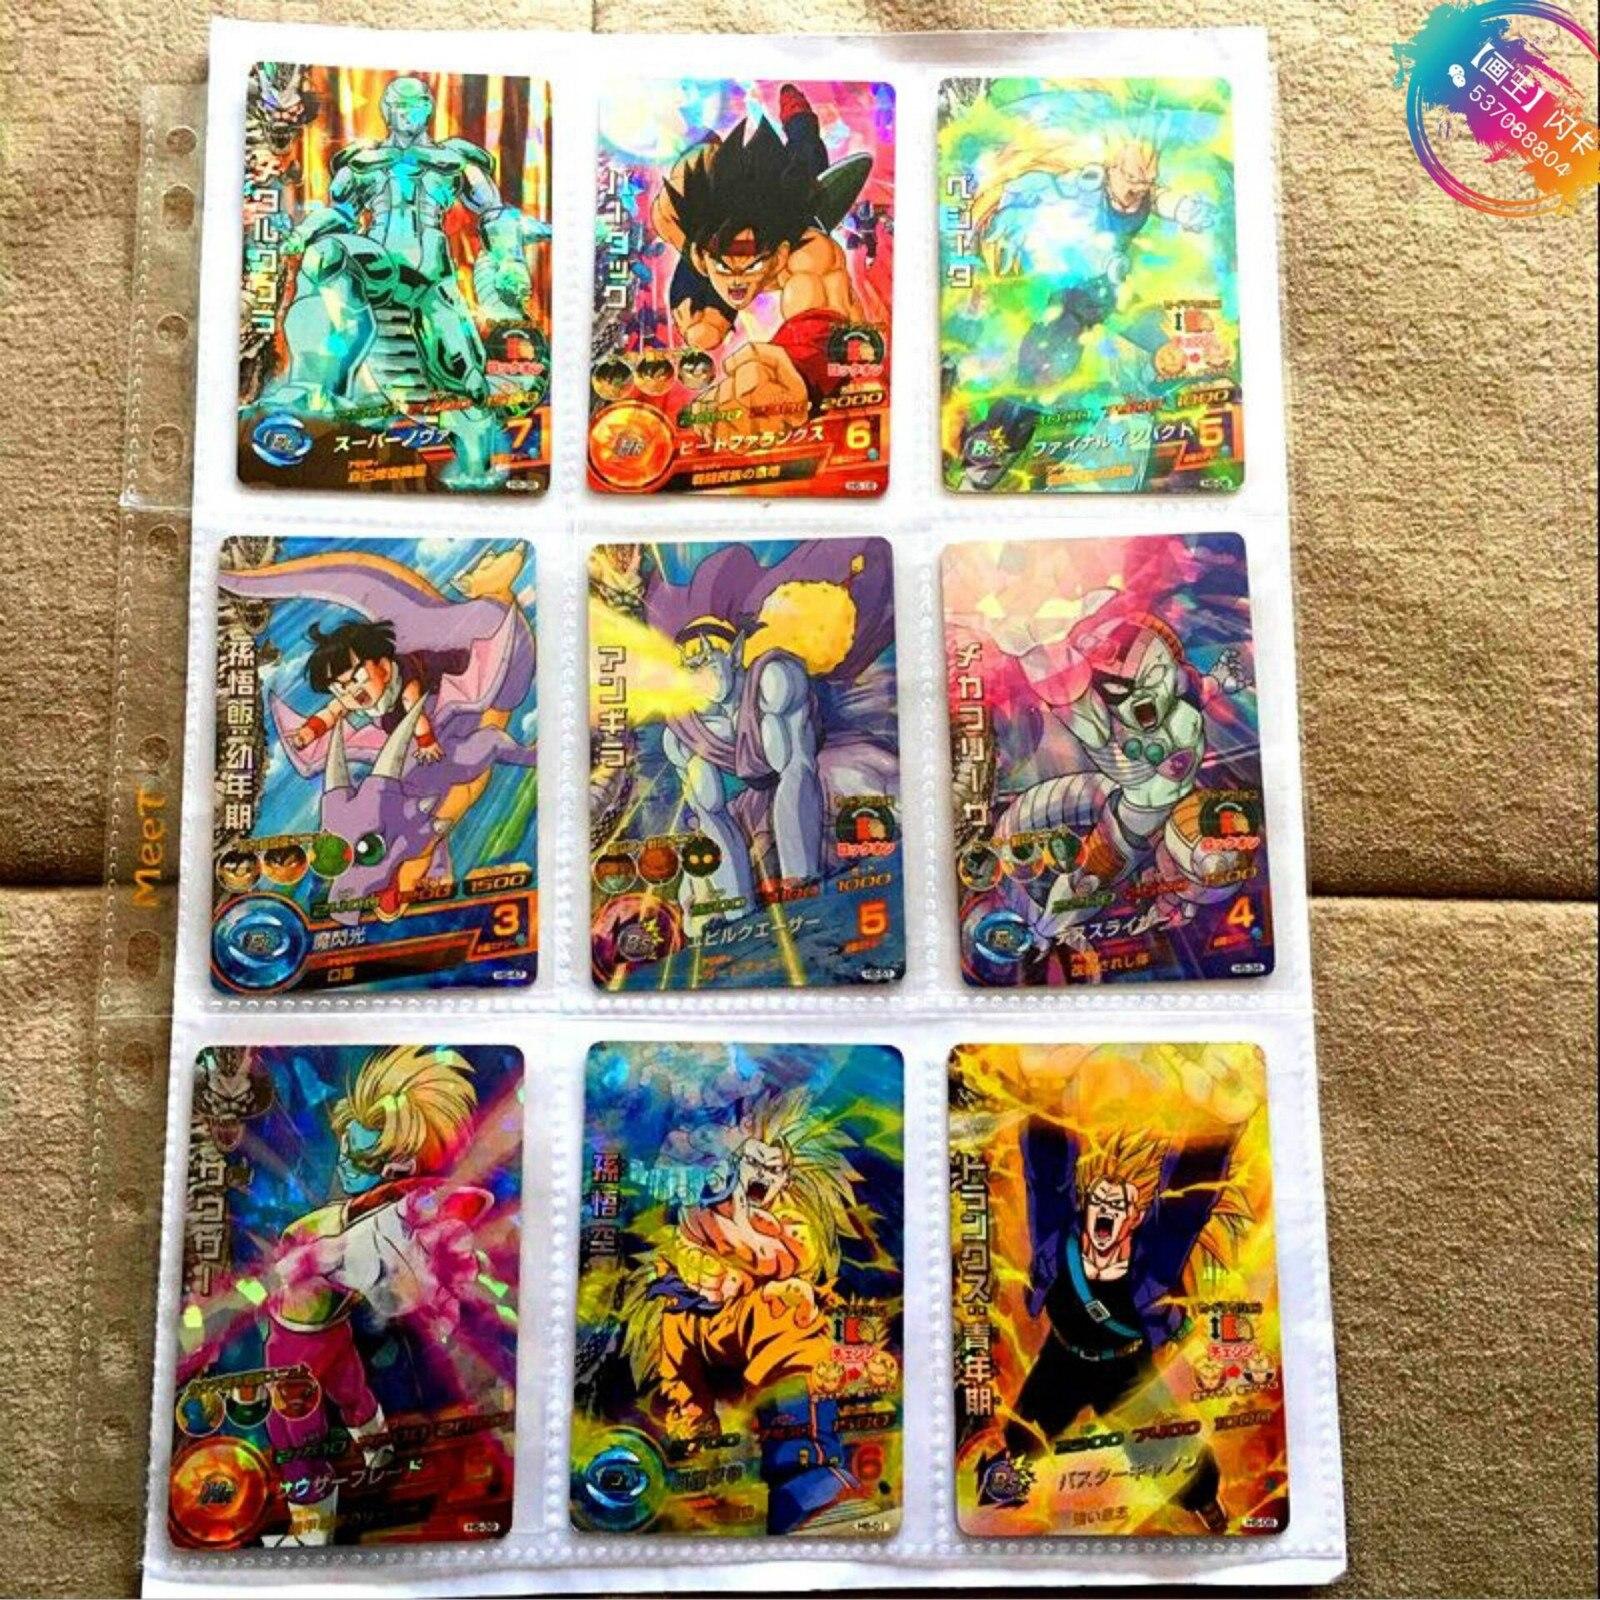 Japan Original Dragon Ball Hero Card SR Flash 3 Stars H5 Goku Toys Hobbies Collectibles Game Collection Anime Cards